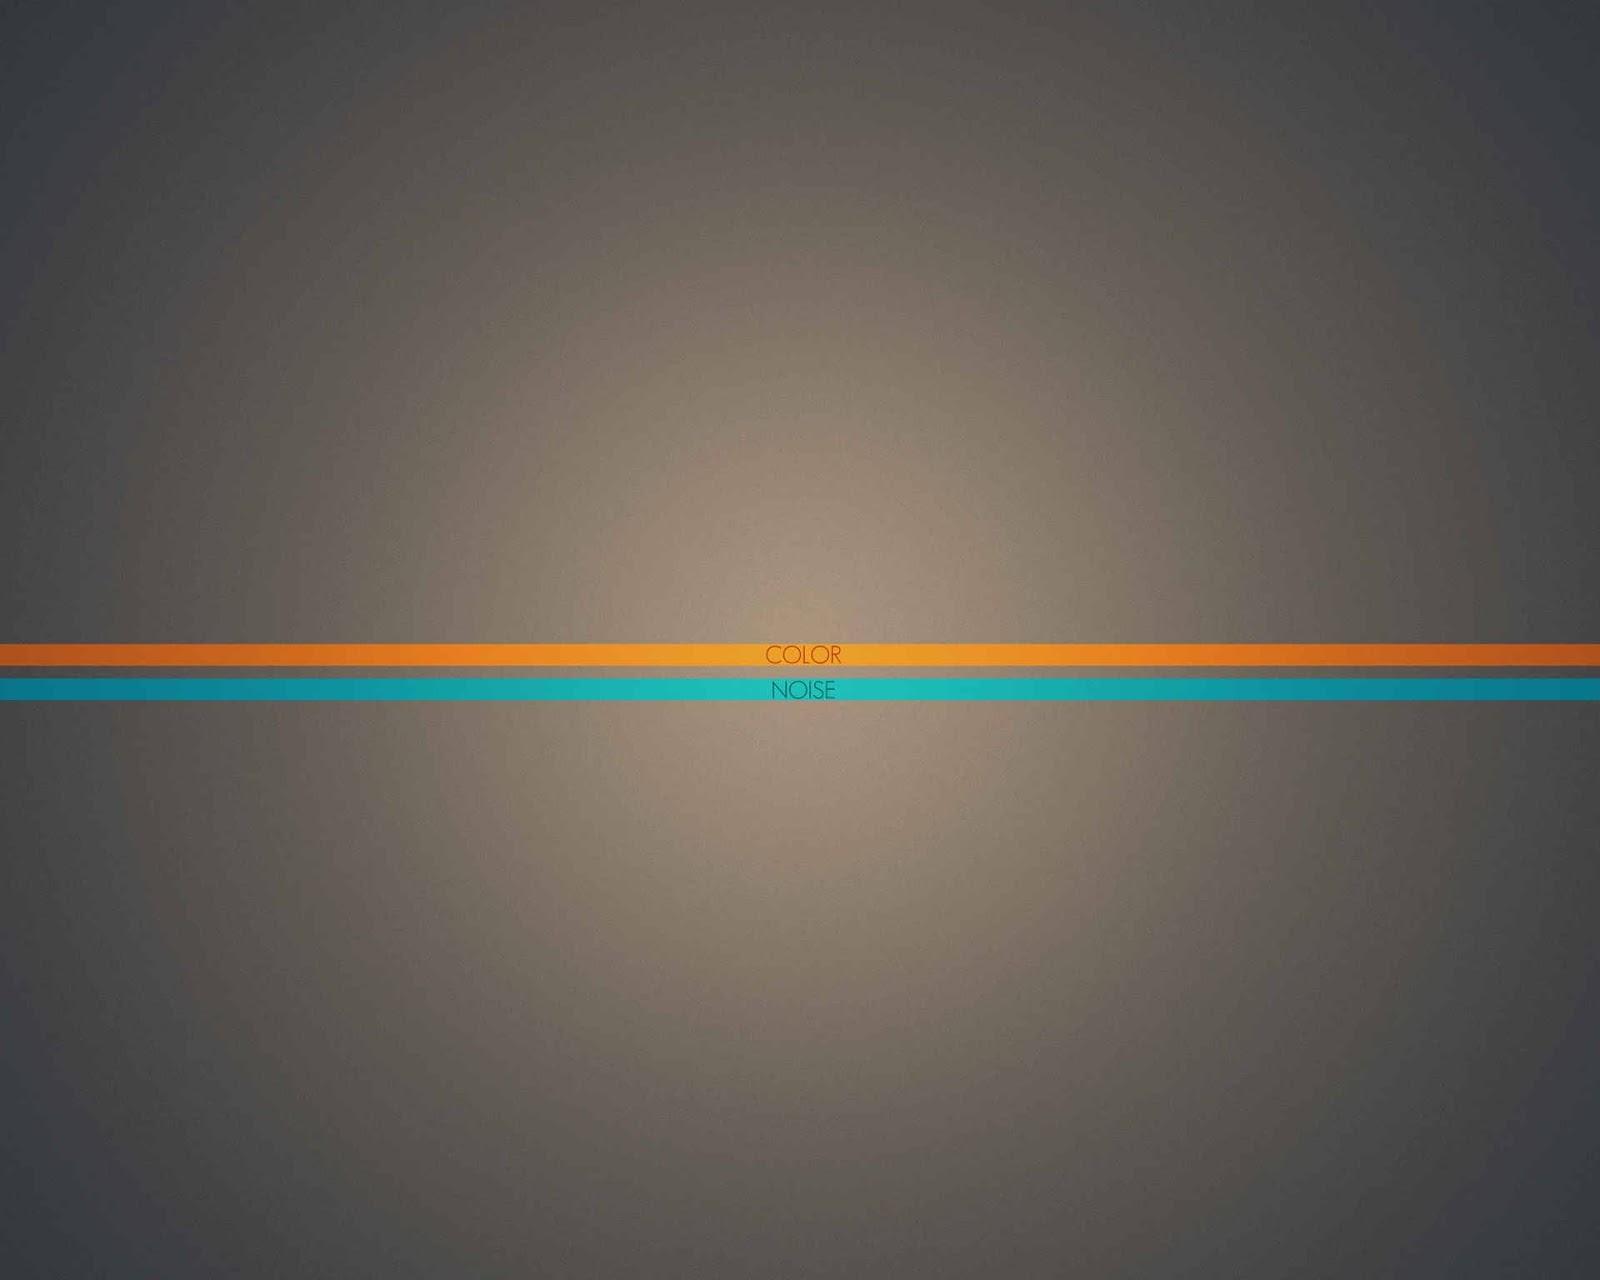 Fondo De Pantalla Abstracto Linea Horizontal Naranja Y